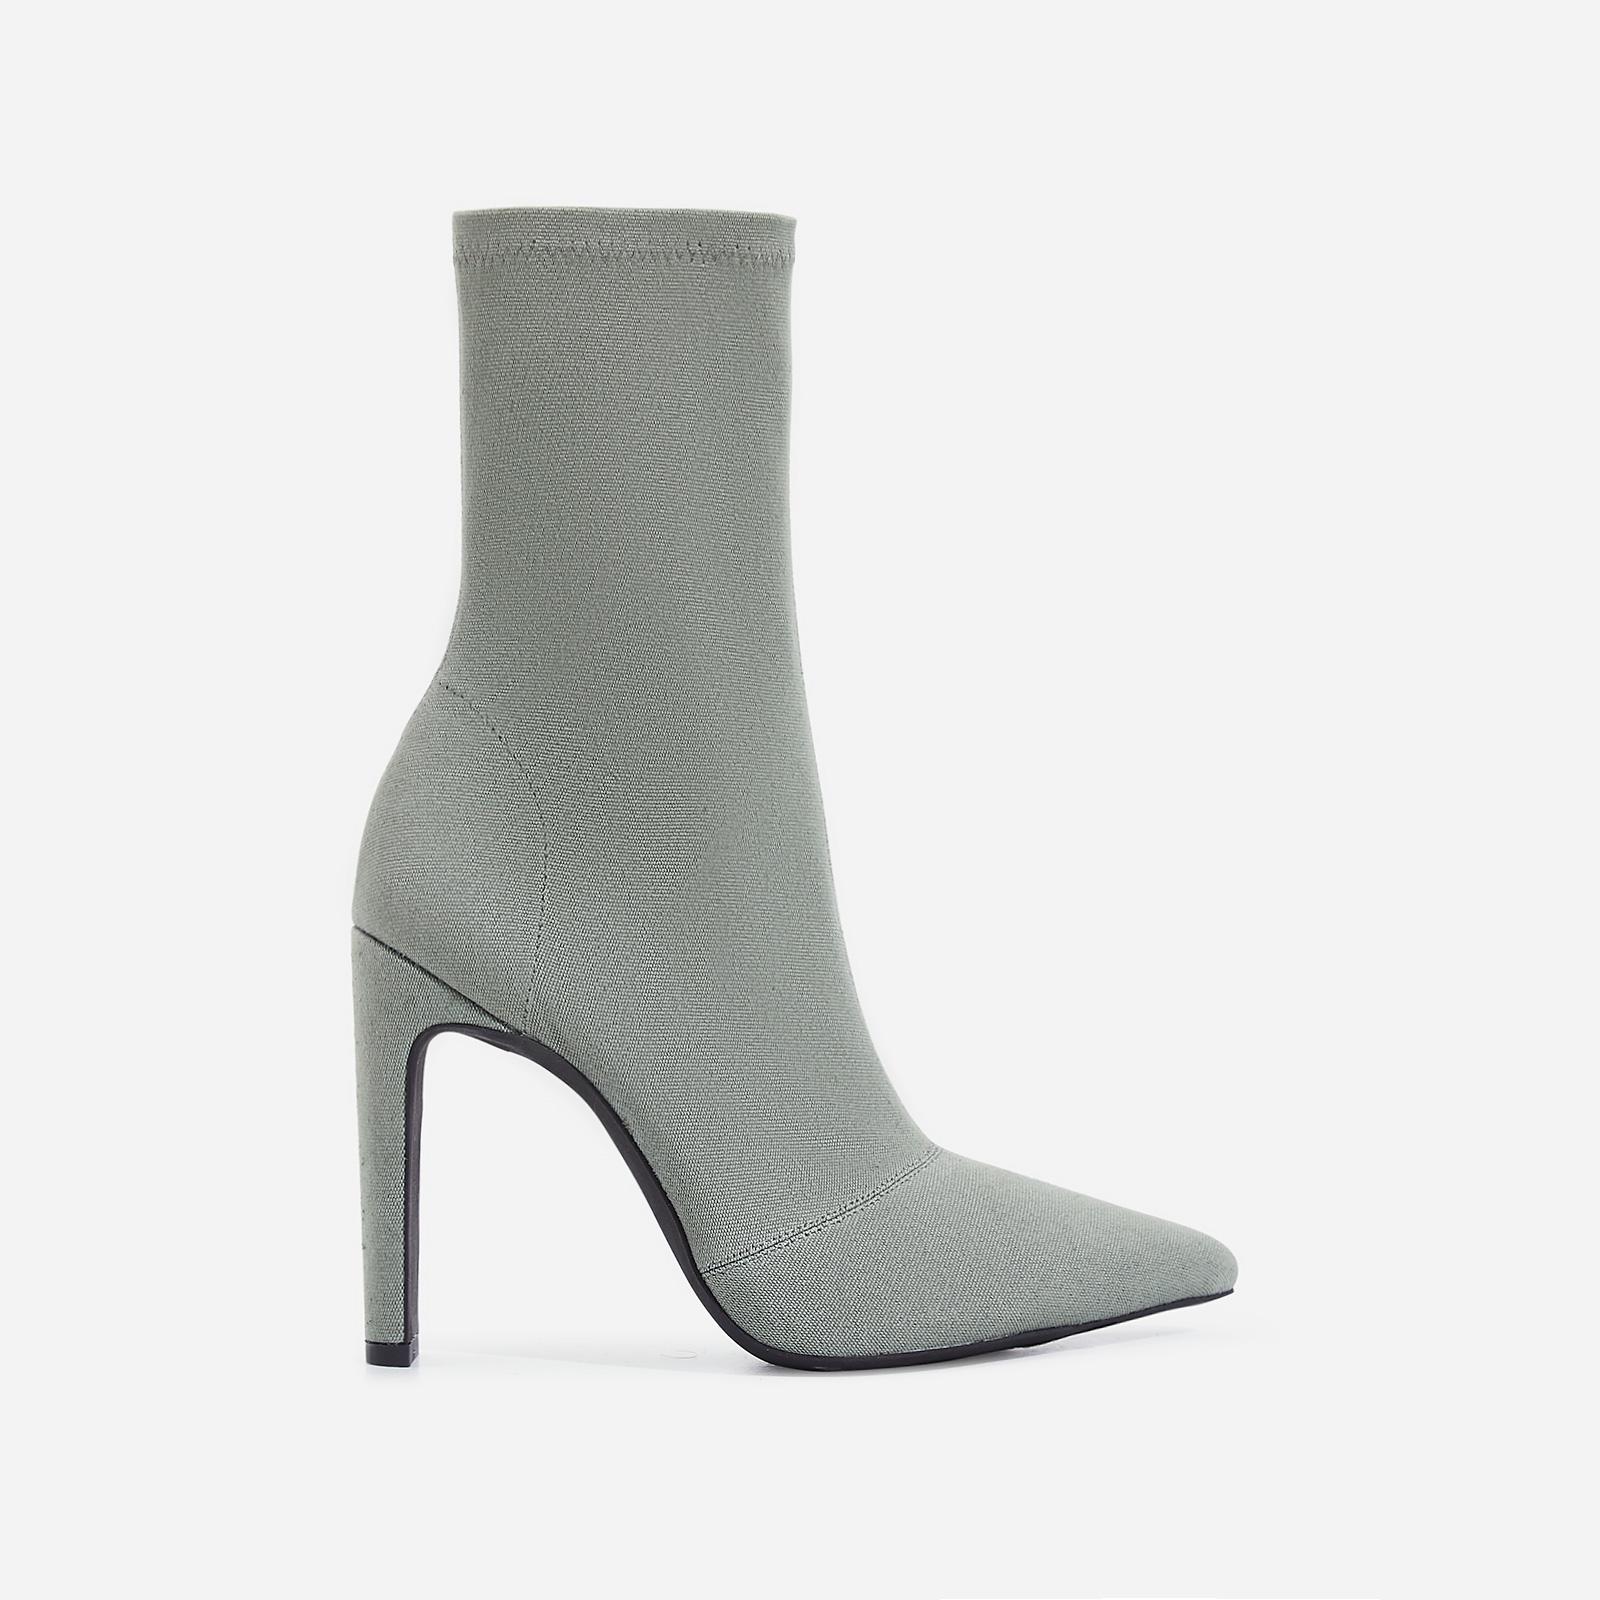 Valencia Thin Block Heel Ankle Sock Boot In Khaki Canvas